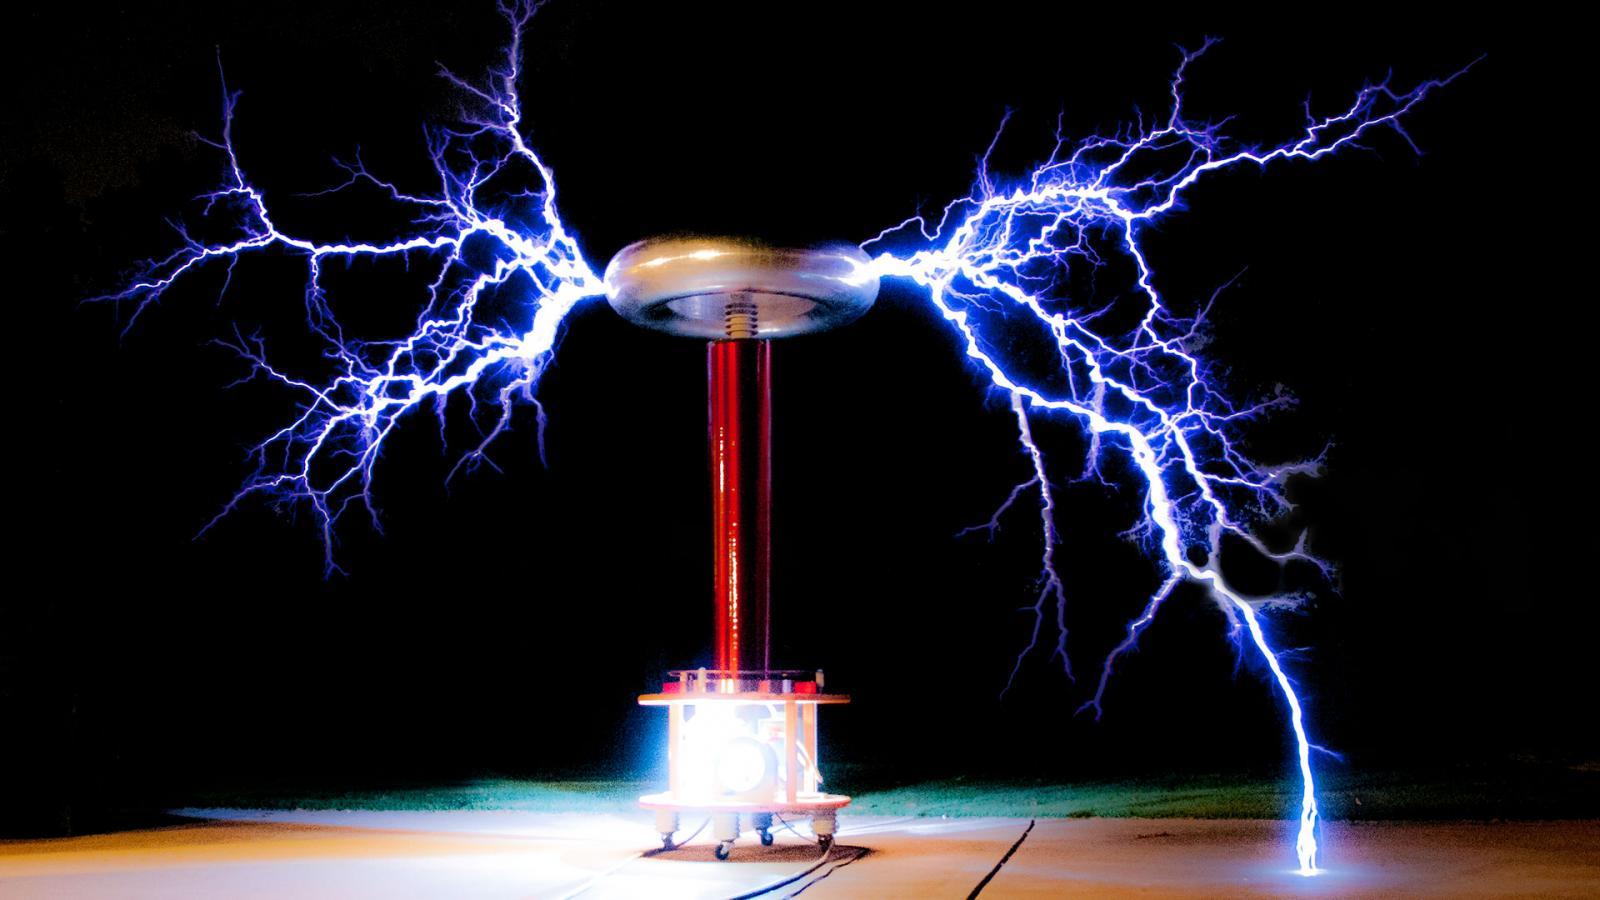 Cameron Prince Nikola Tesla Historian And Tesla Coil Builder